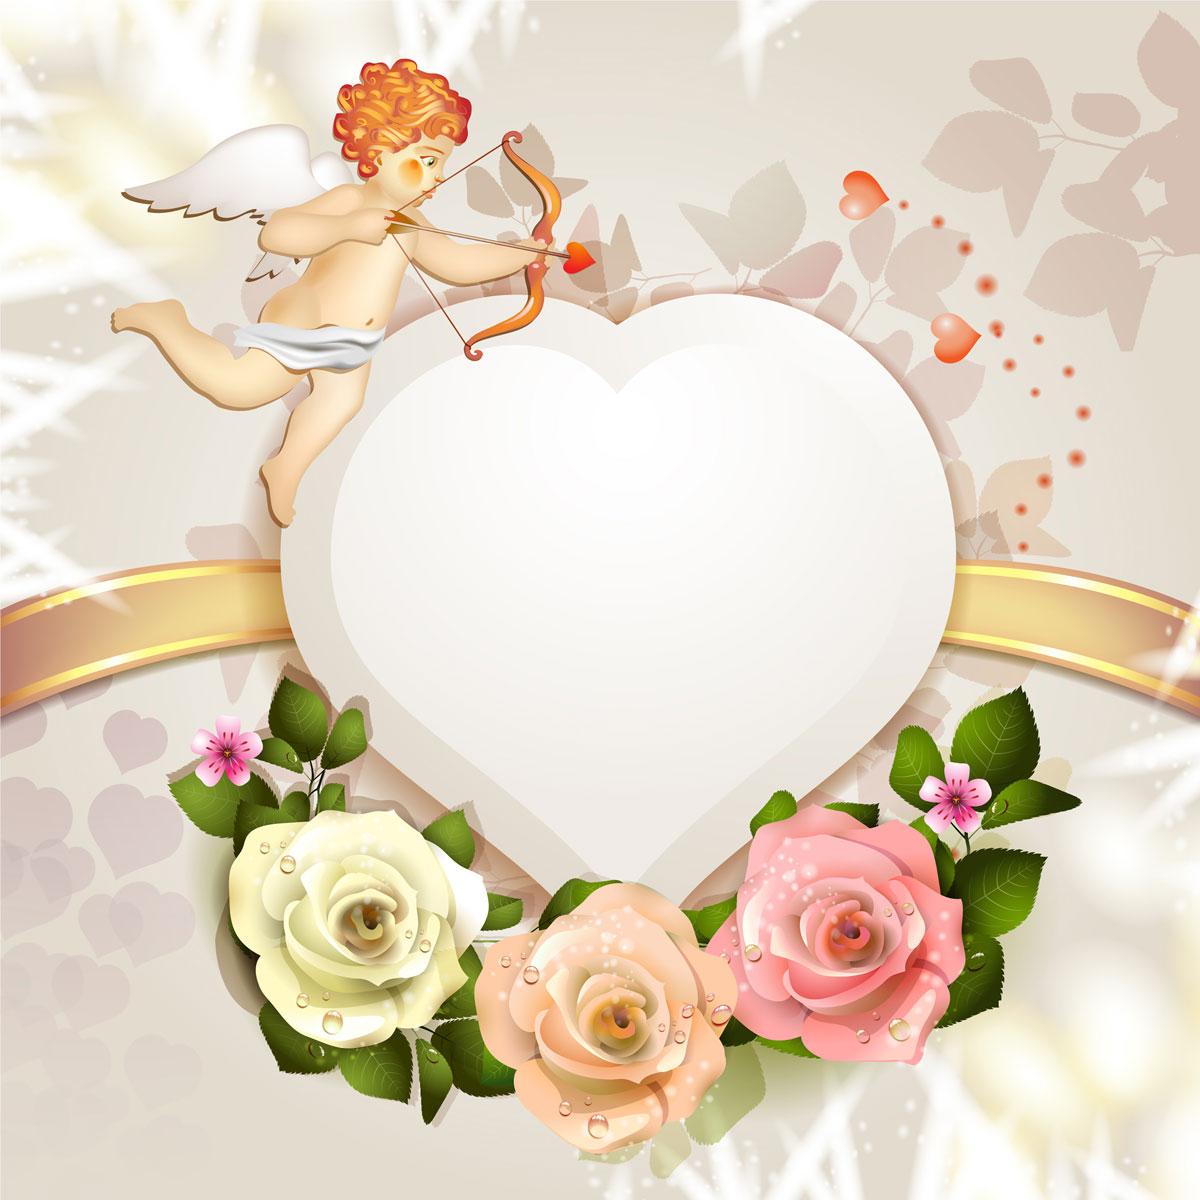 13款情人节七夕节爱心心形宣传海报设计AI矢量素材 Valentines Day Heart-shaped Vector Poster插图1